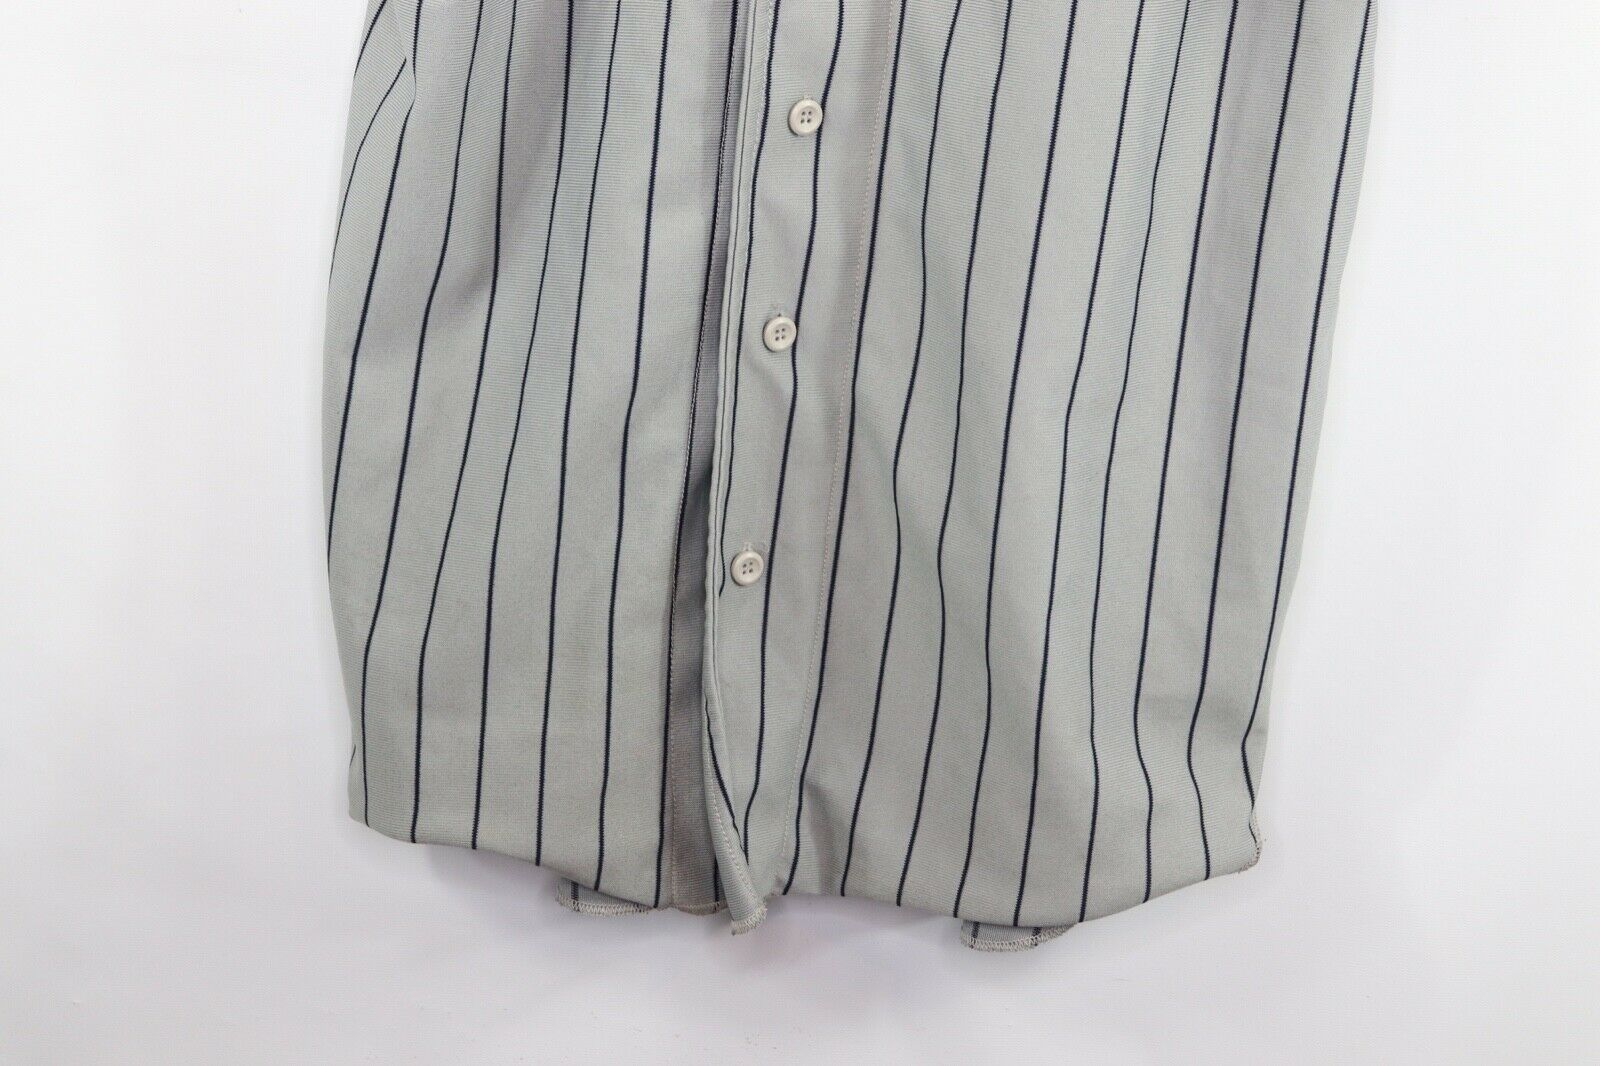 Vintage 90s Mens XL New York Yankees MLB Baseball Jersey Pinstripe Gray Blue image 2